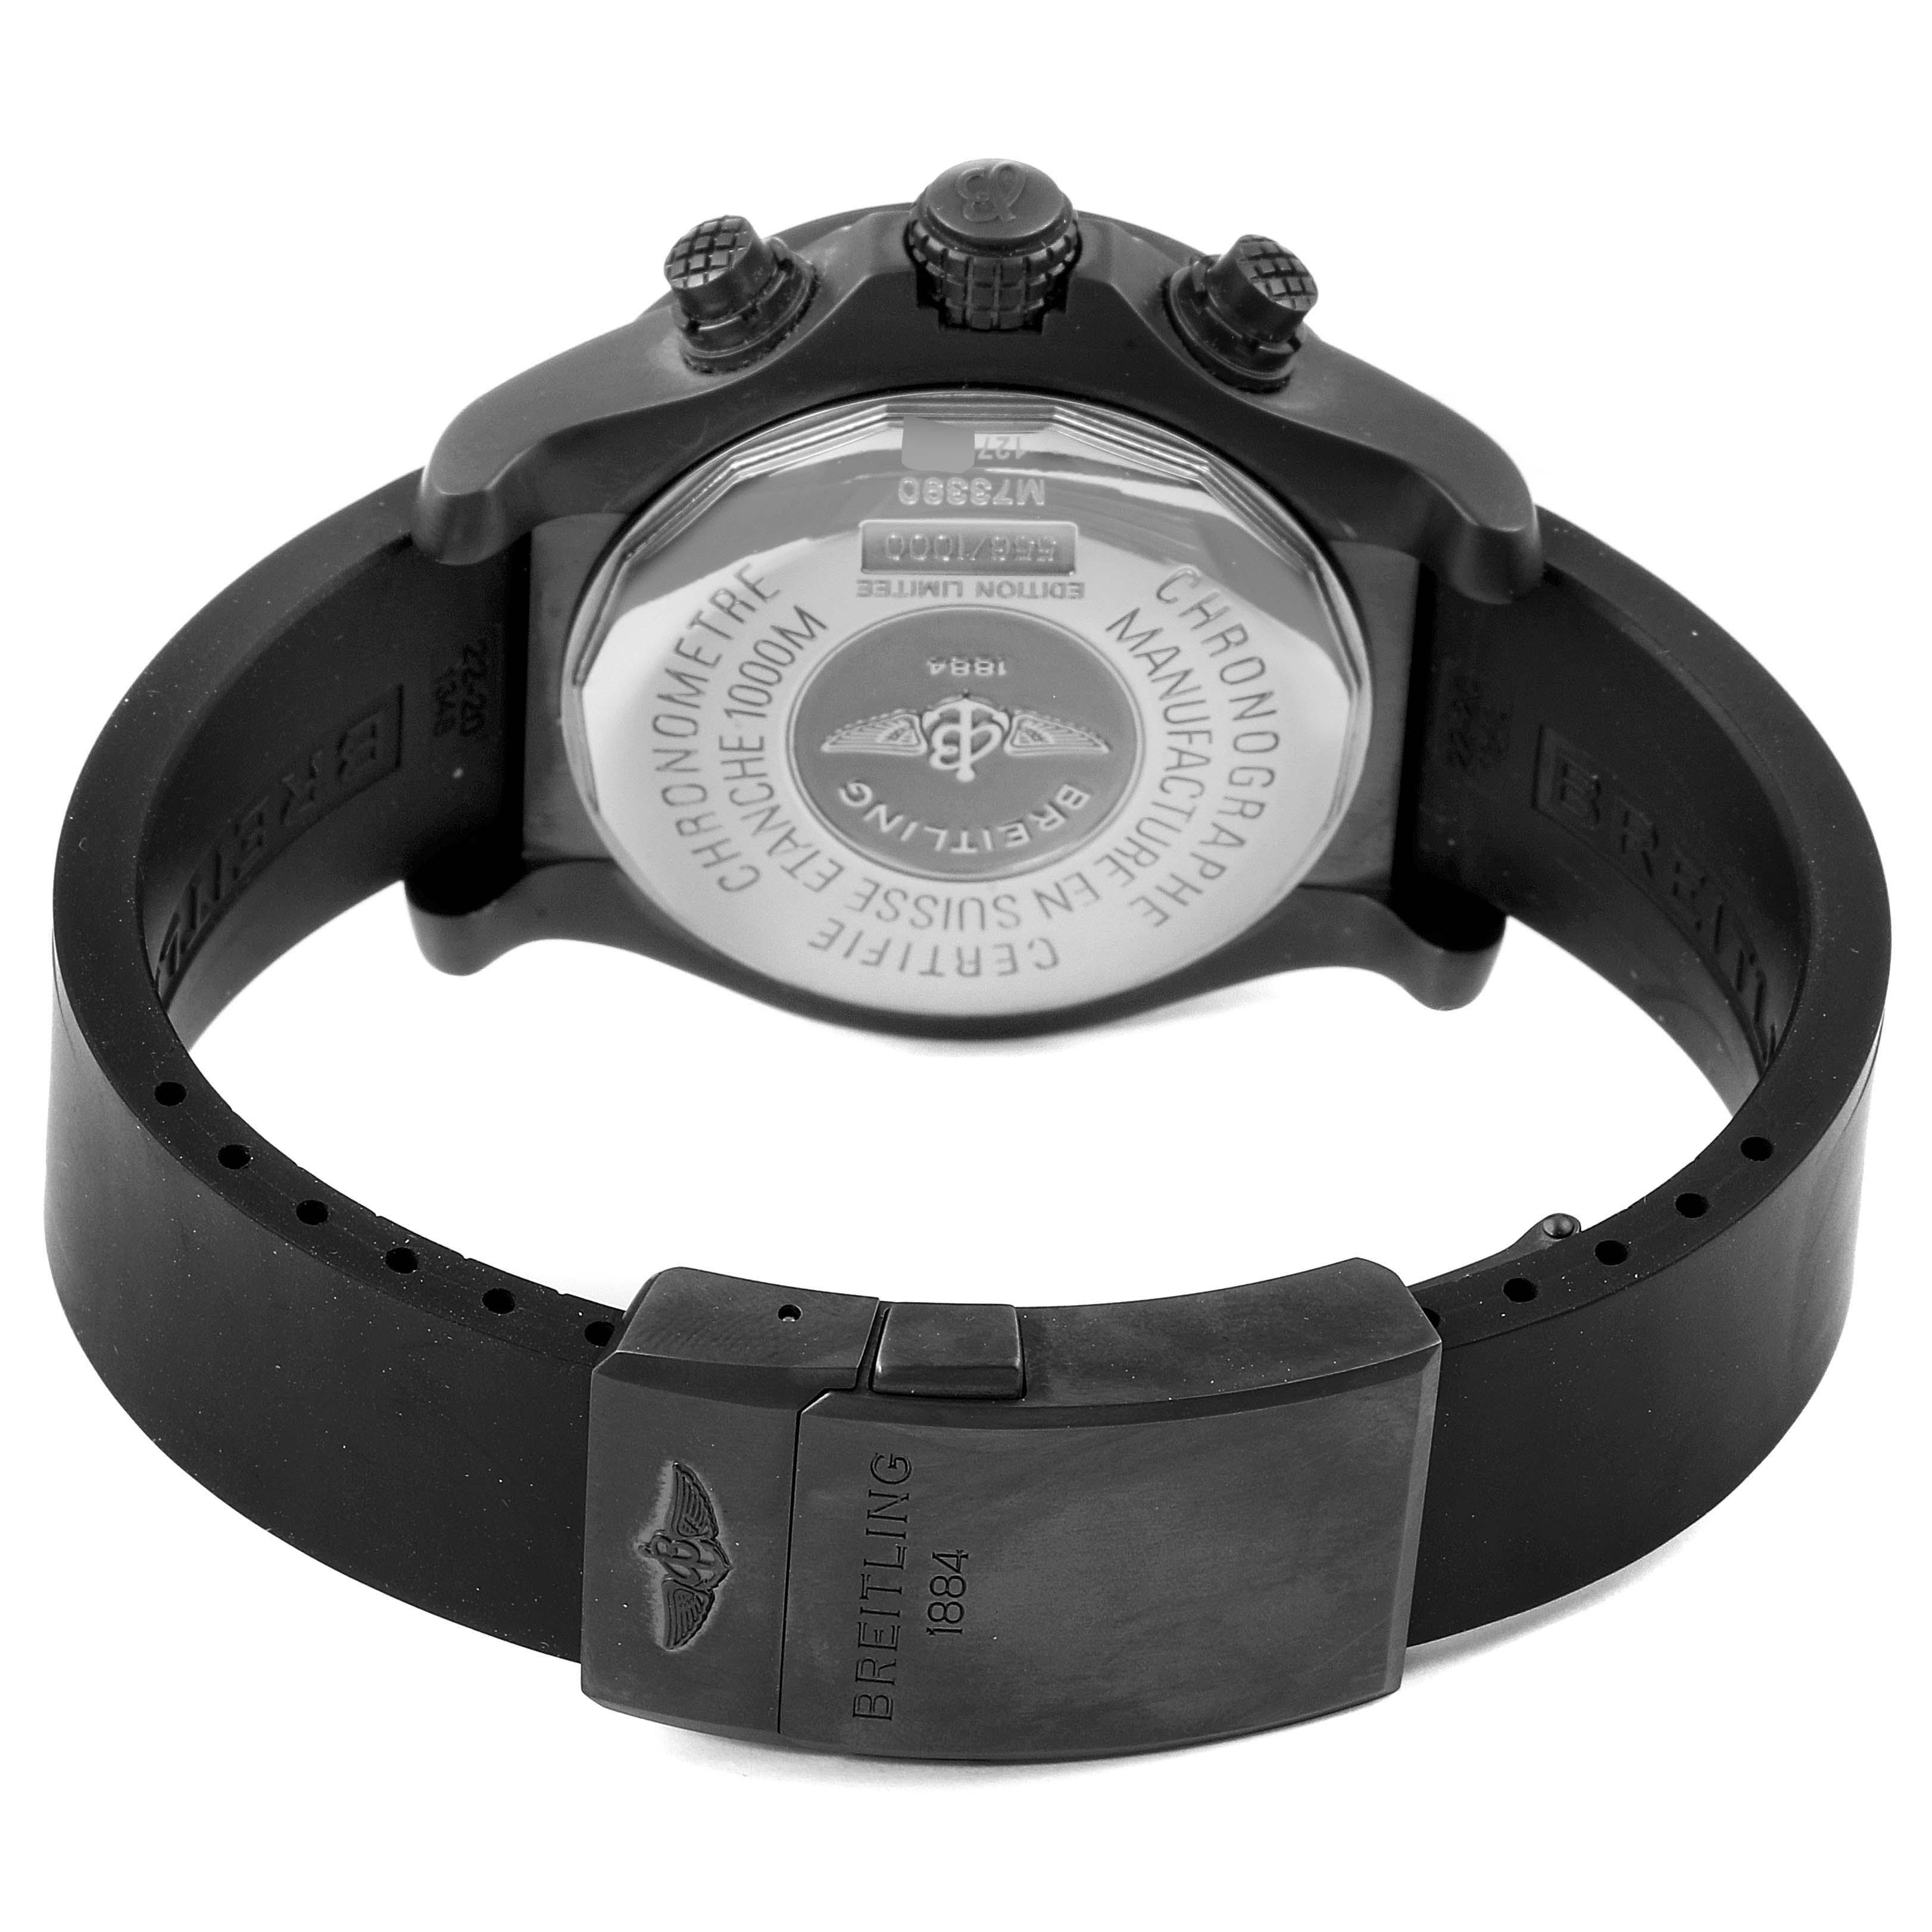 Breitling Avenger Seawolf Blacksteel Chrono Yellow Hands Watch M73390 Unworn SwissWatchExpo